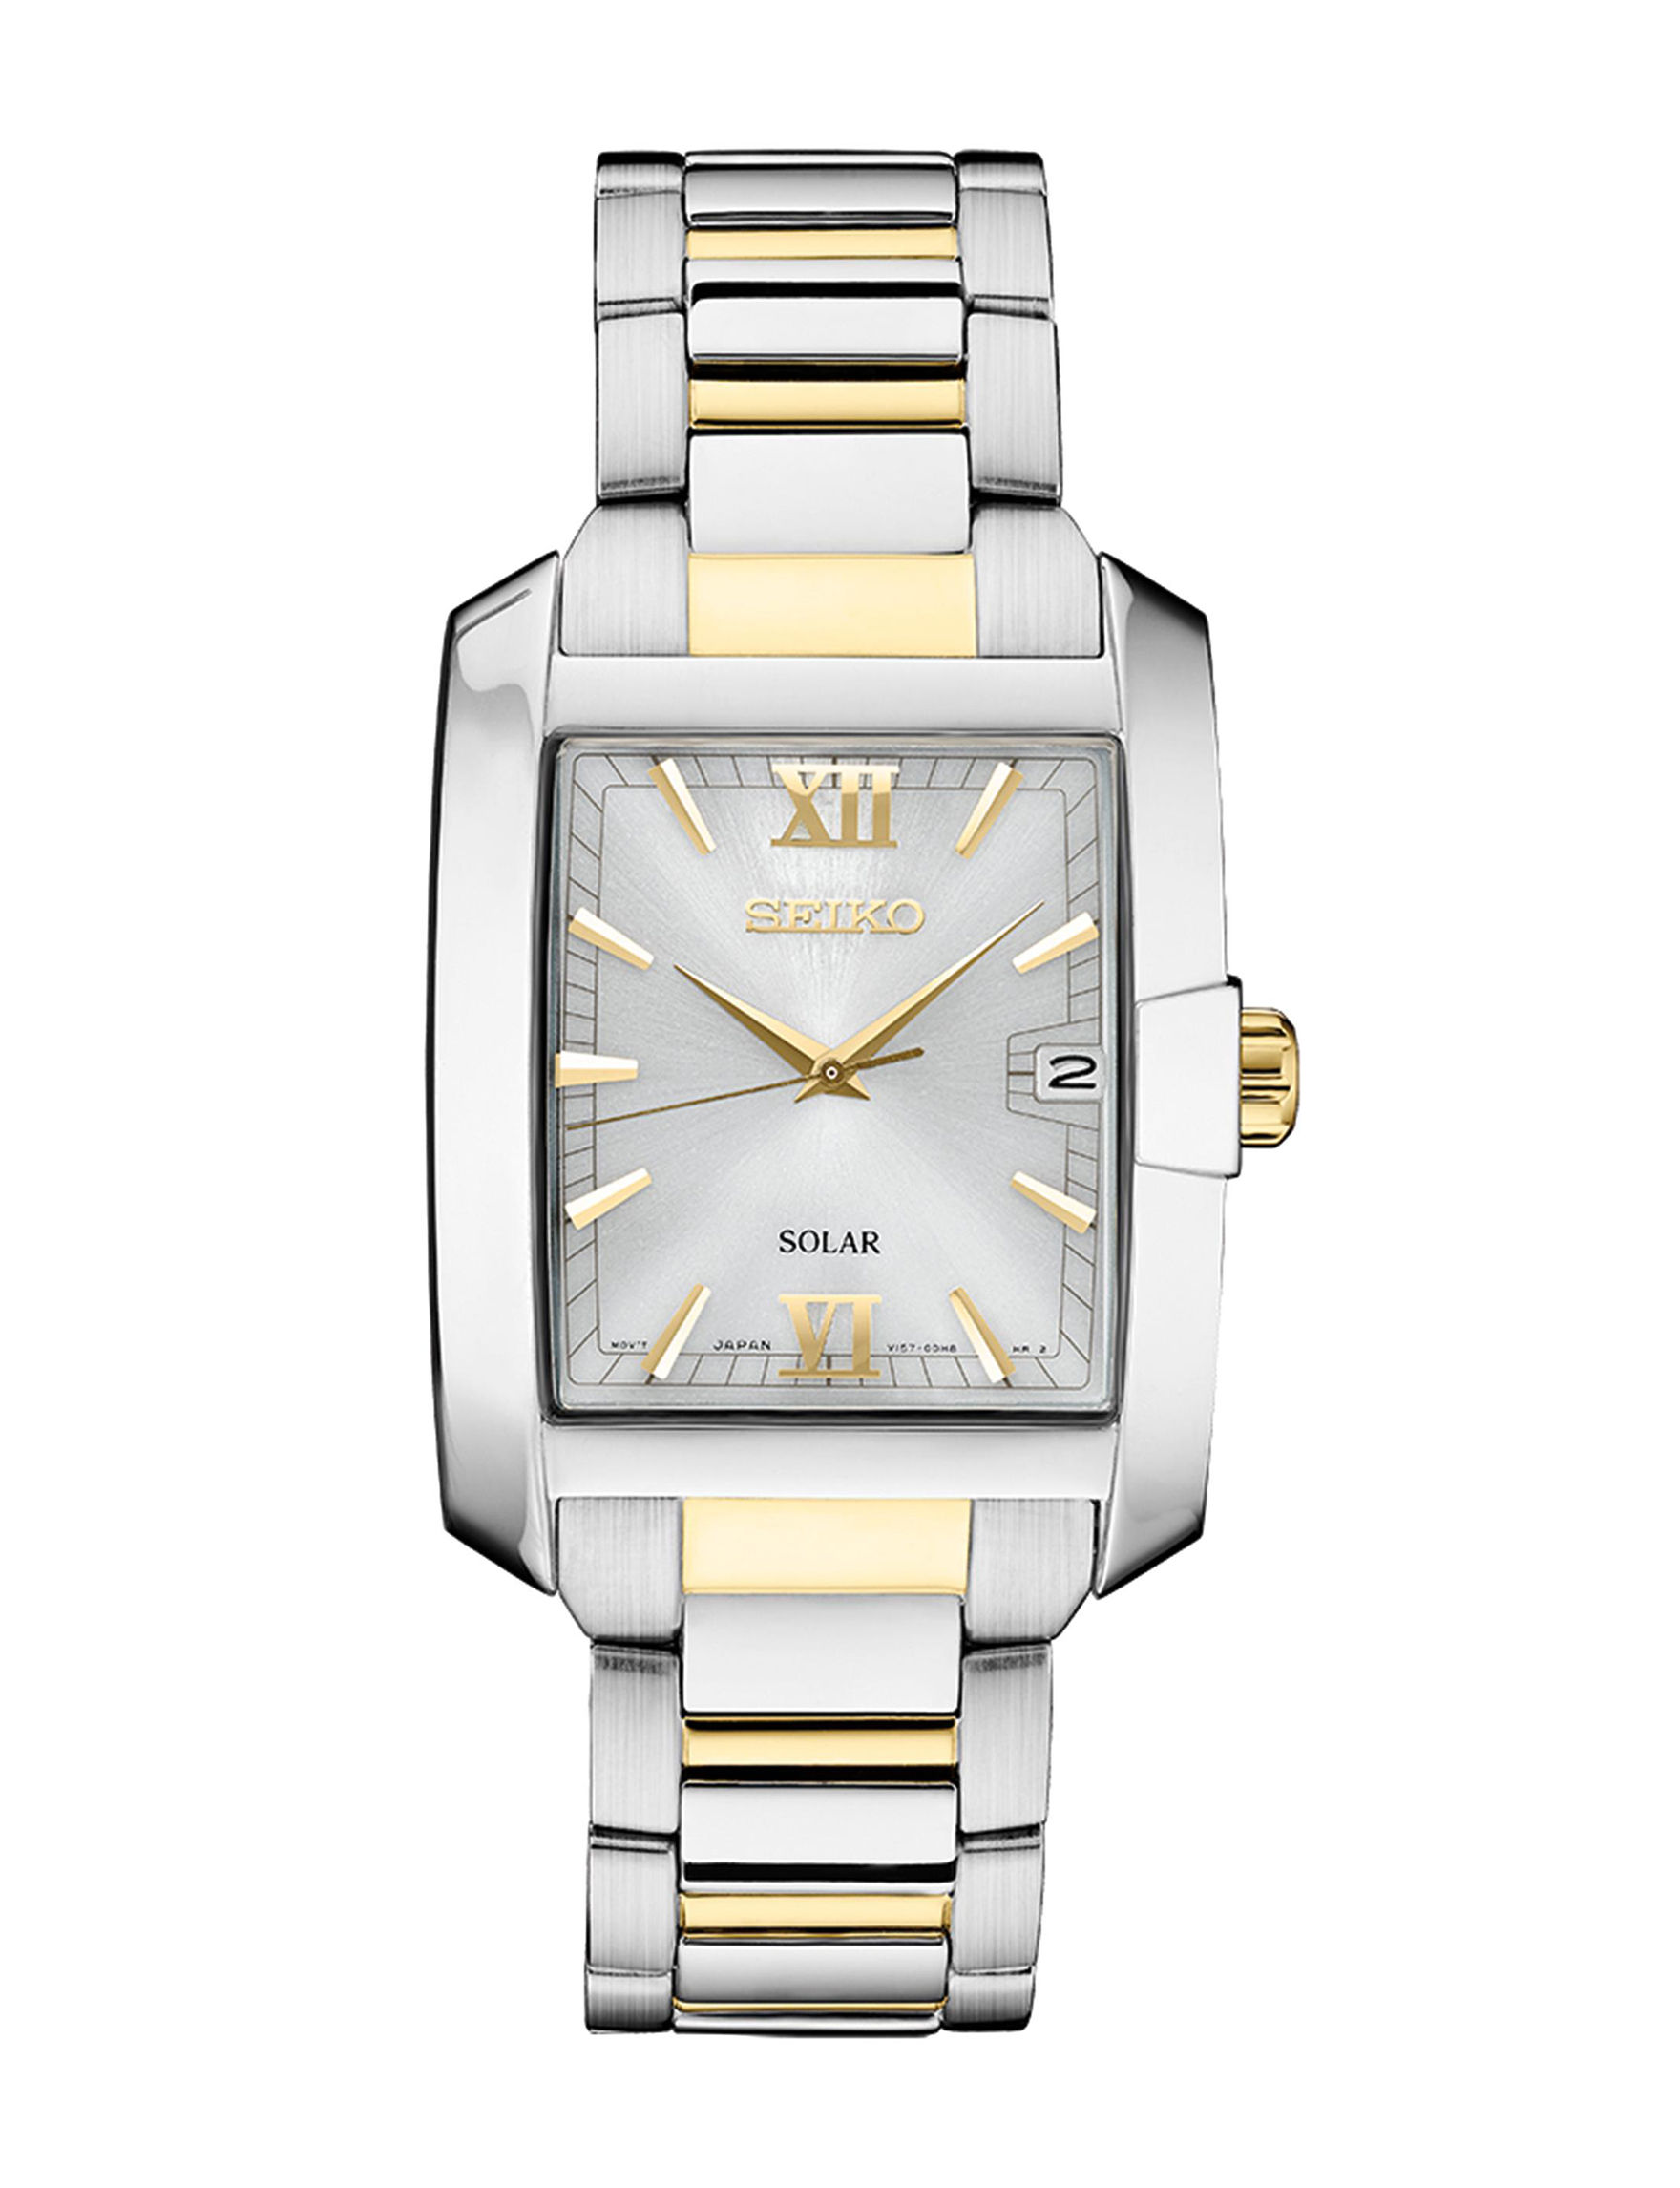 Seiko Silver / Gold Fashion Watches Accessories